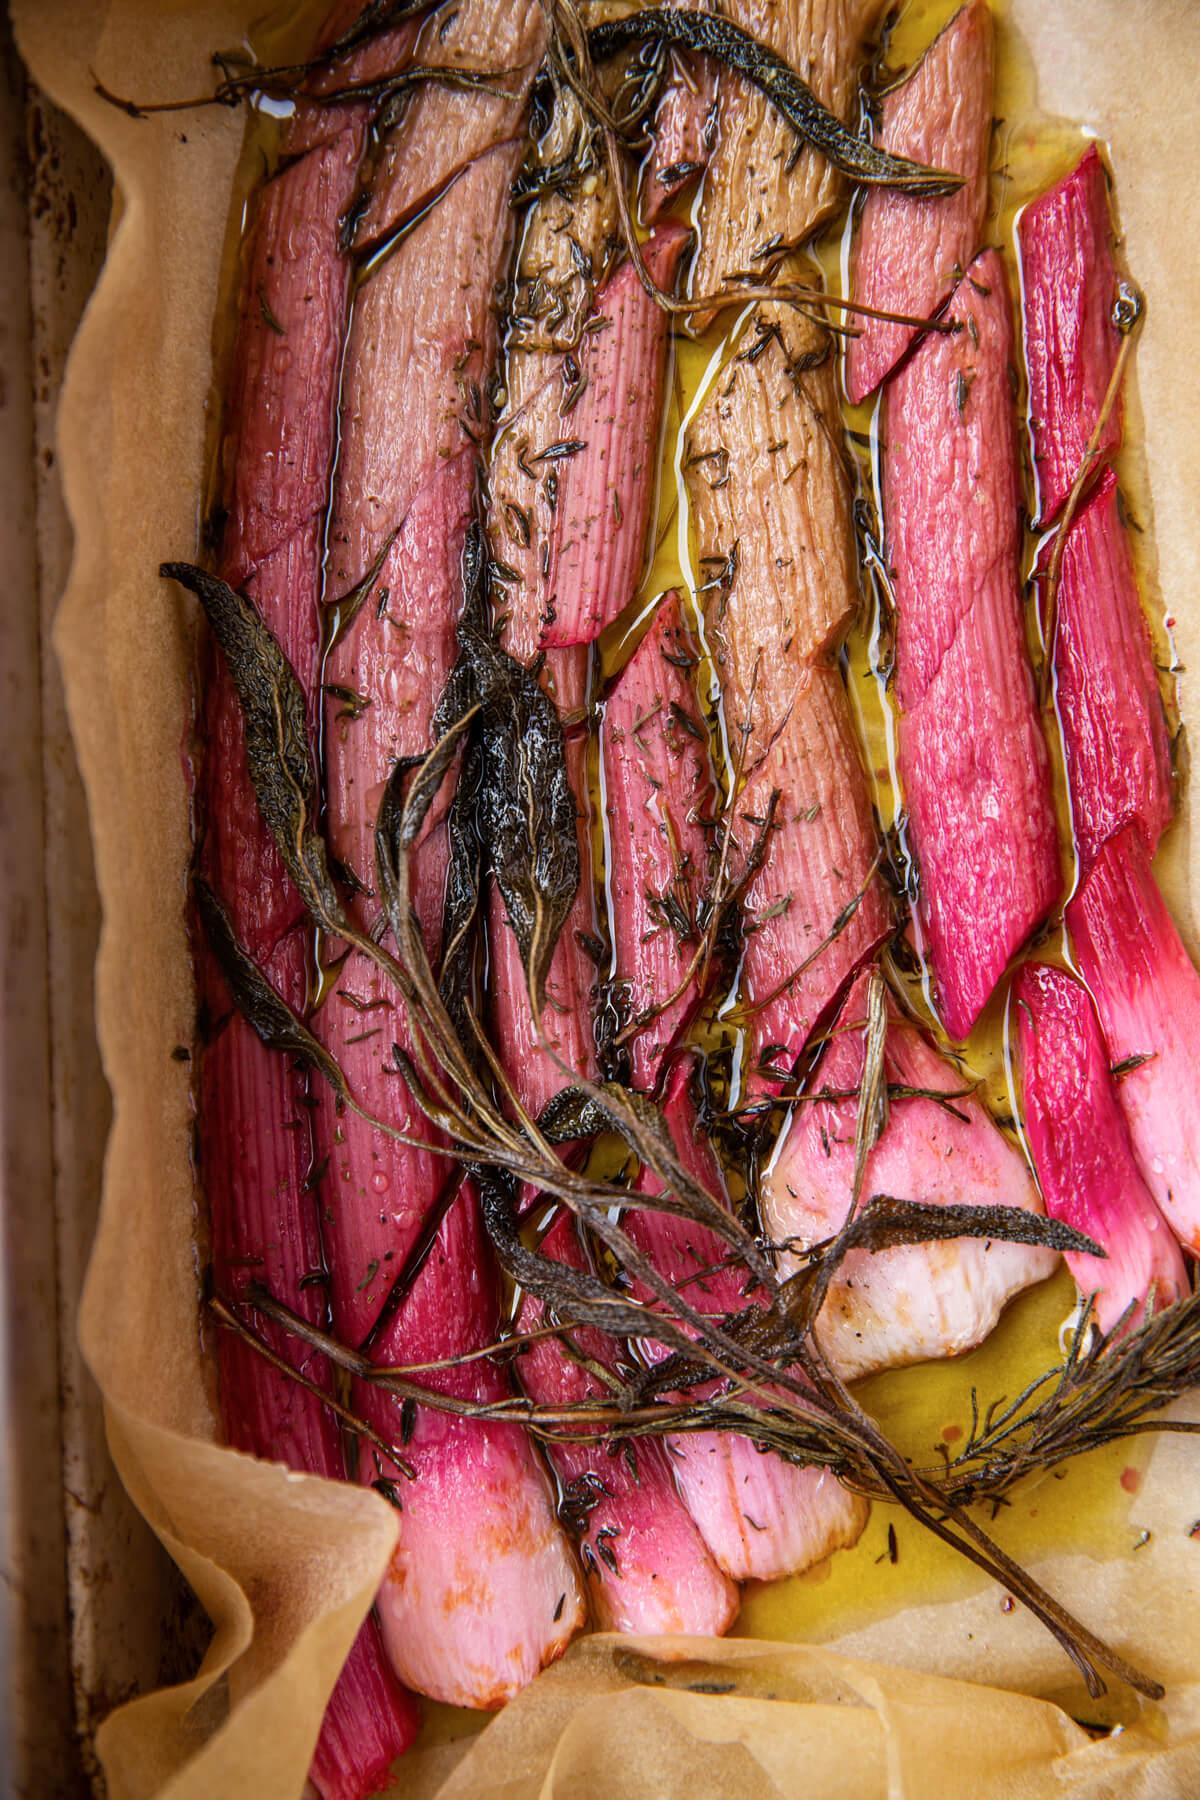 Garniture de rhubarbe salée